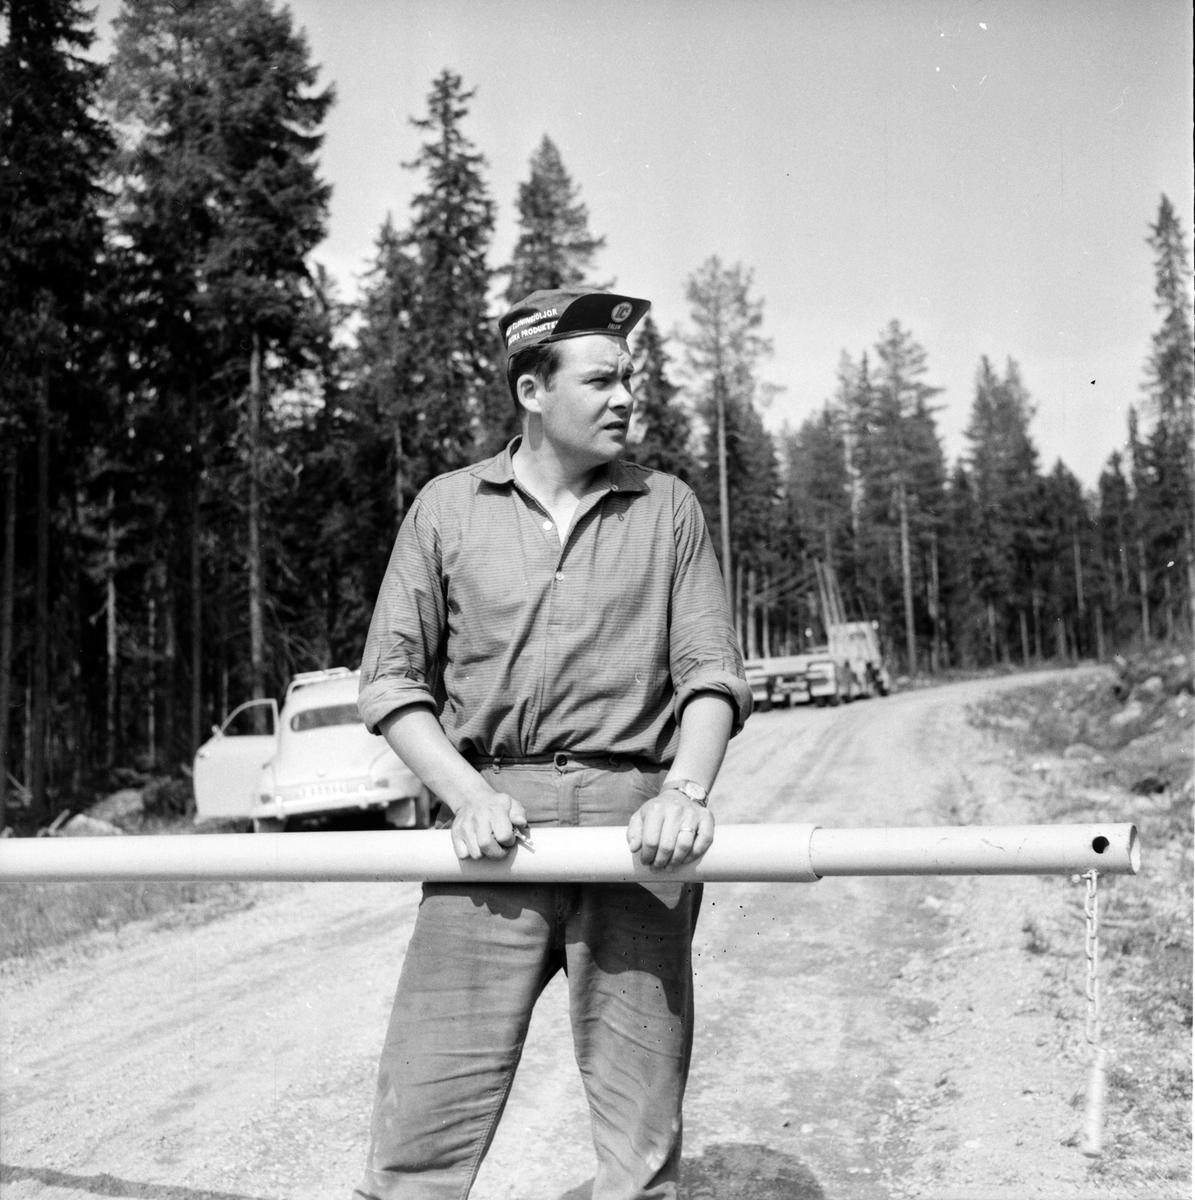 Gruvberget. Othzon, Thomasson, Iver Jonsson 30/5-1961